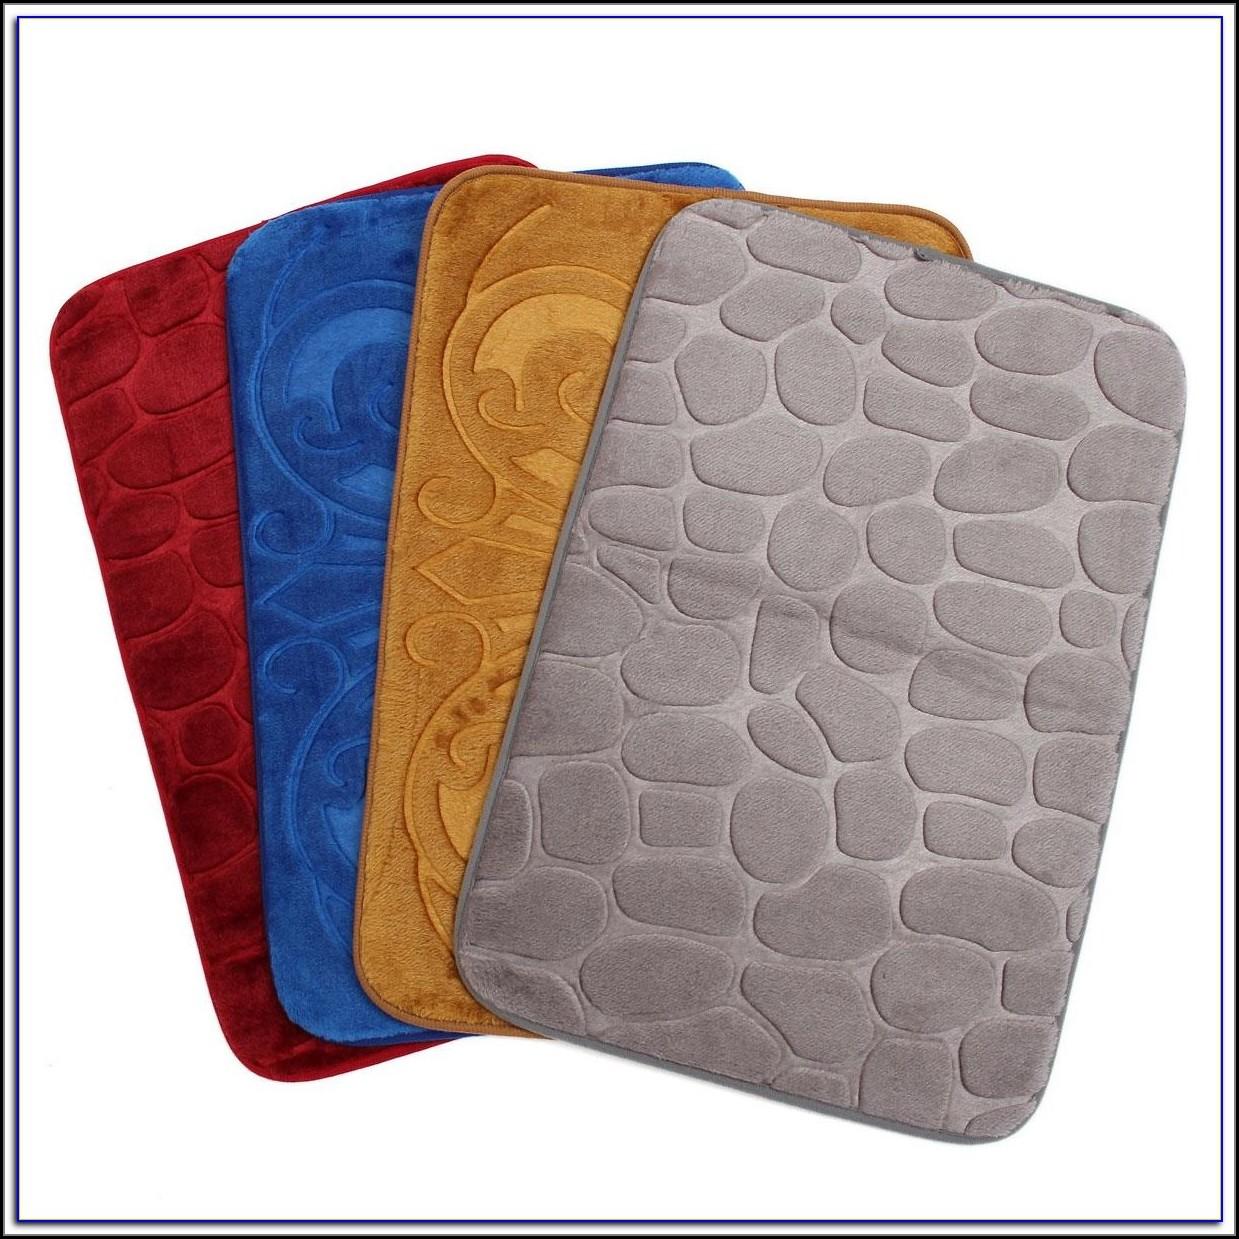 Memory Foam Area Rug 5x7